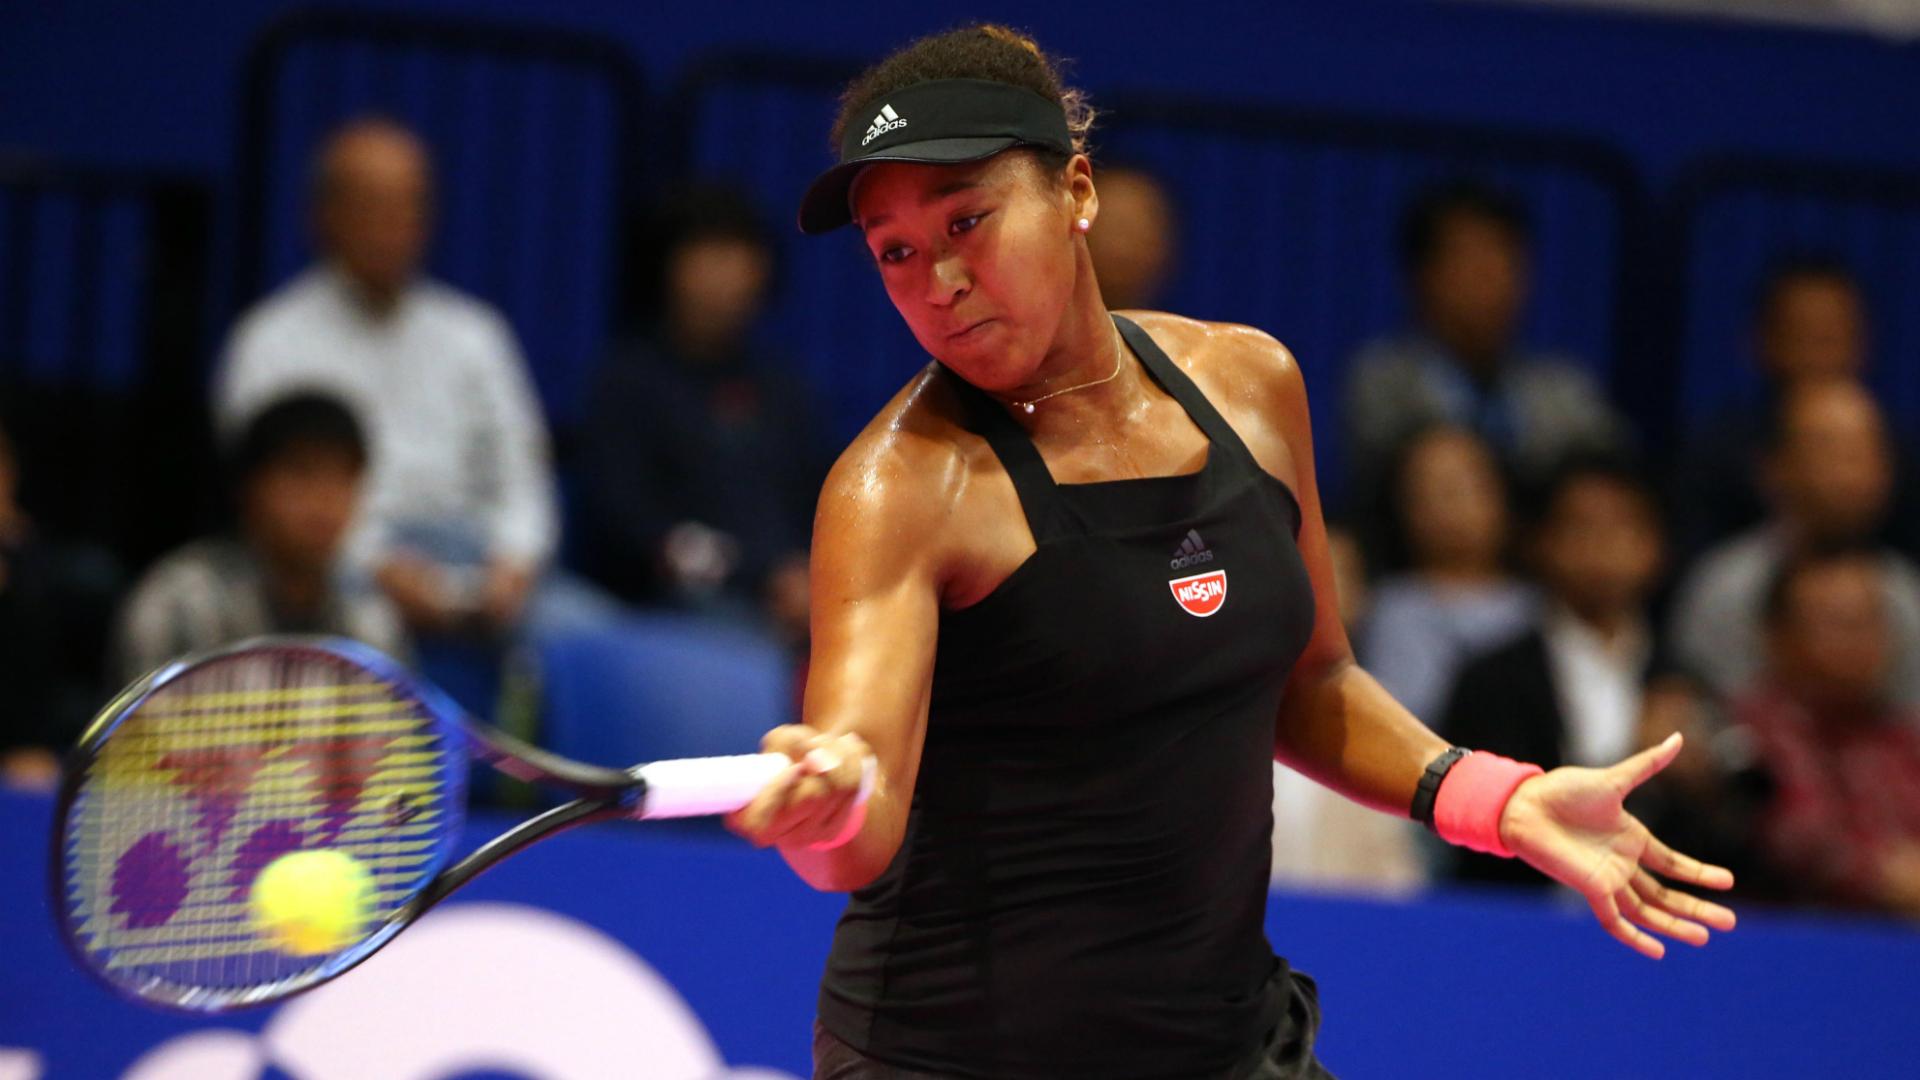 Pan Pacific Open: Karolina Pliskova beats Naomi Osaka